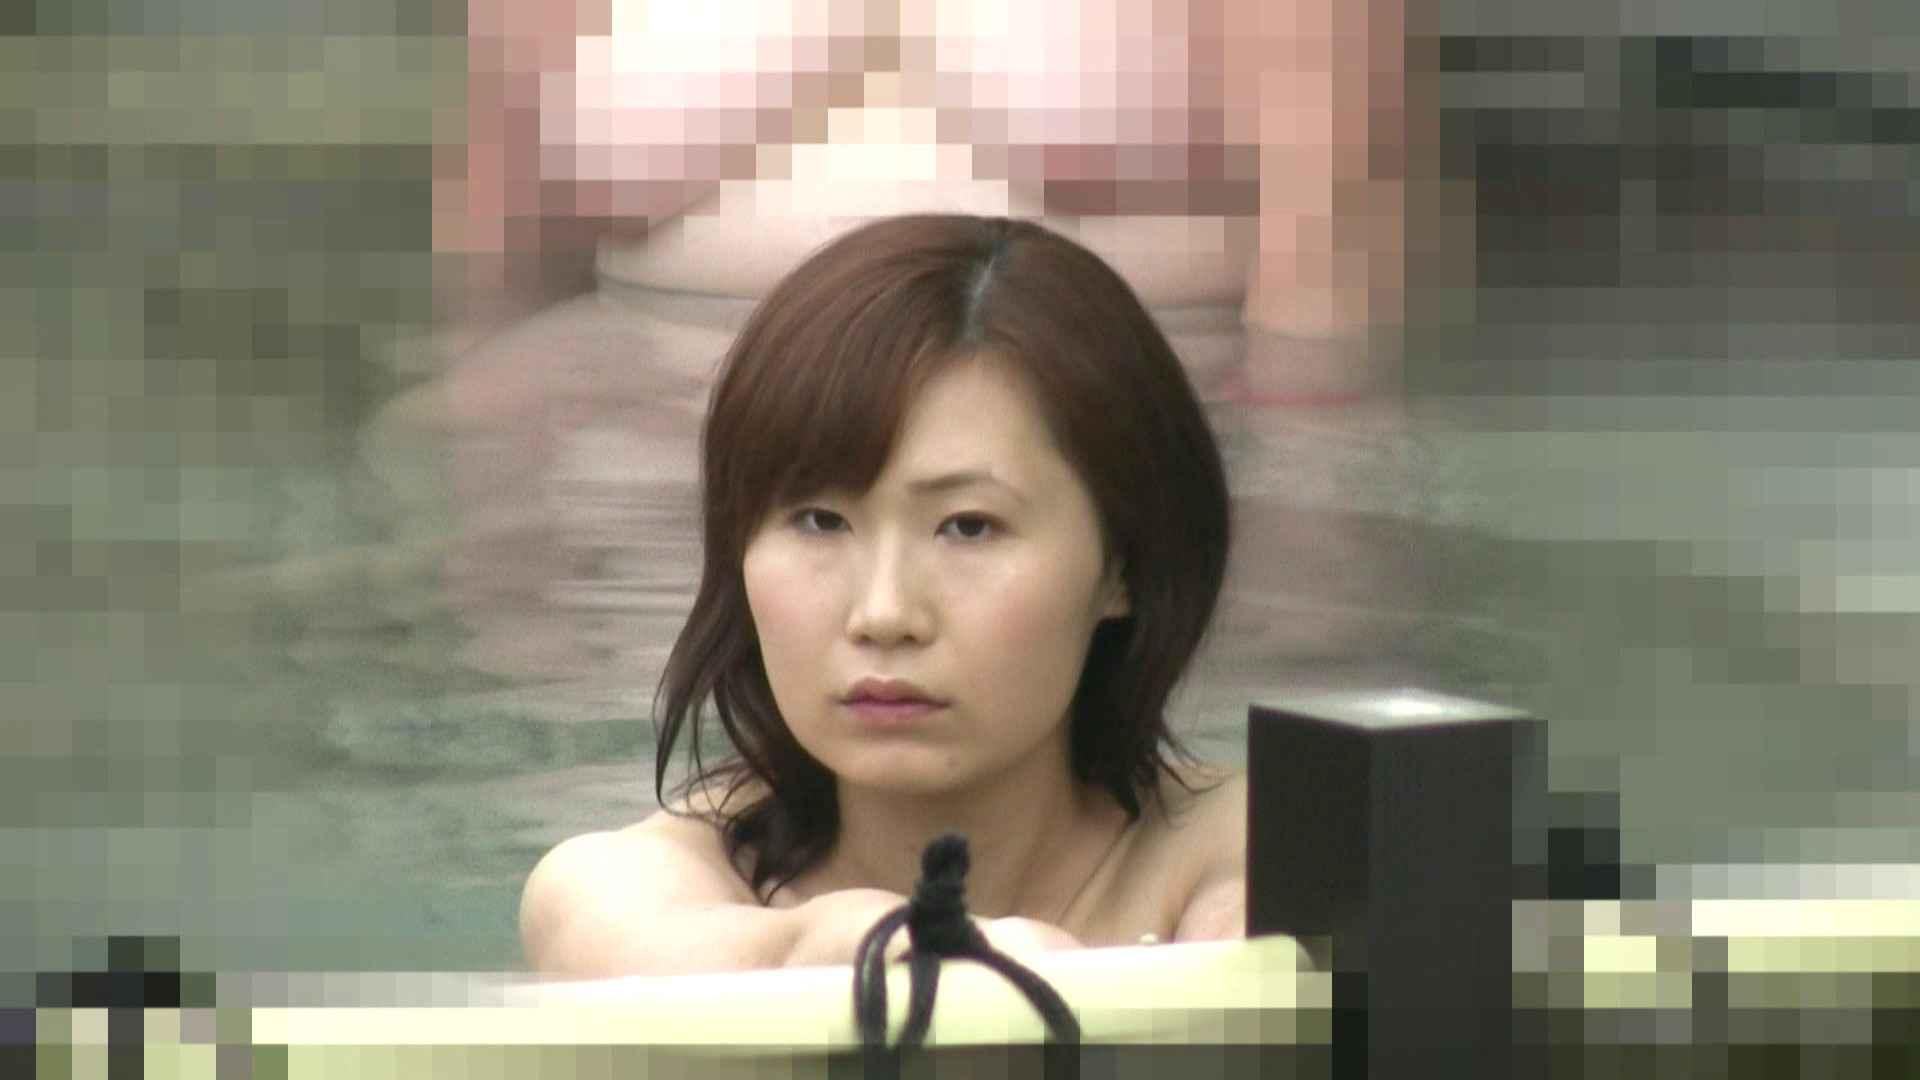 Aquaな露天風呂Vol.814 盗撮 | OLエロ画像  33PICs 13